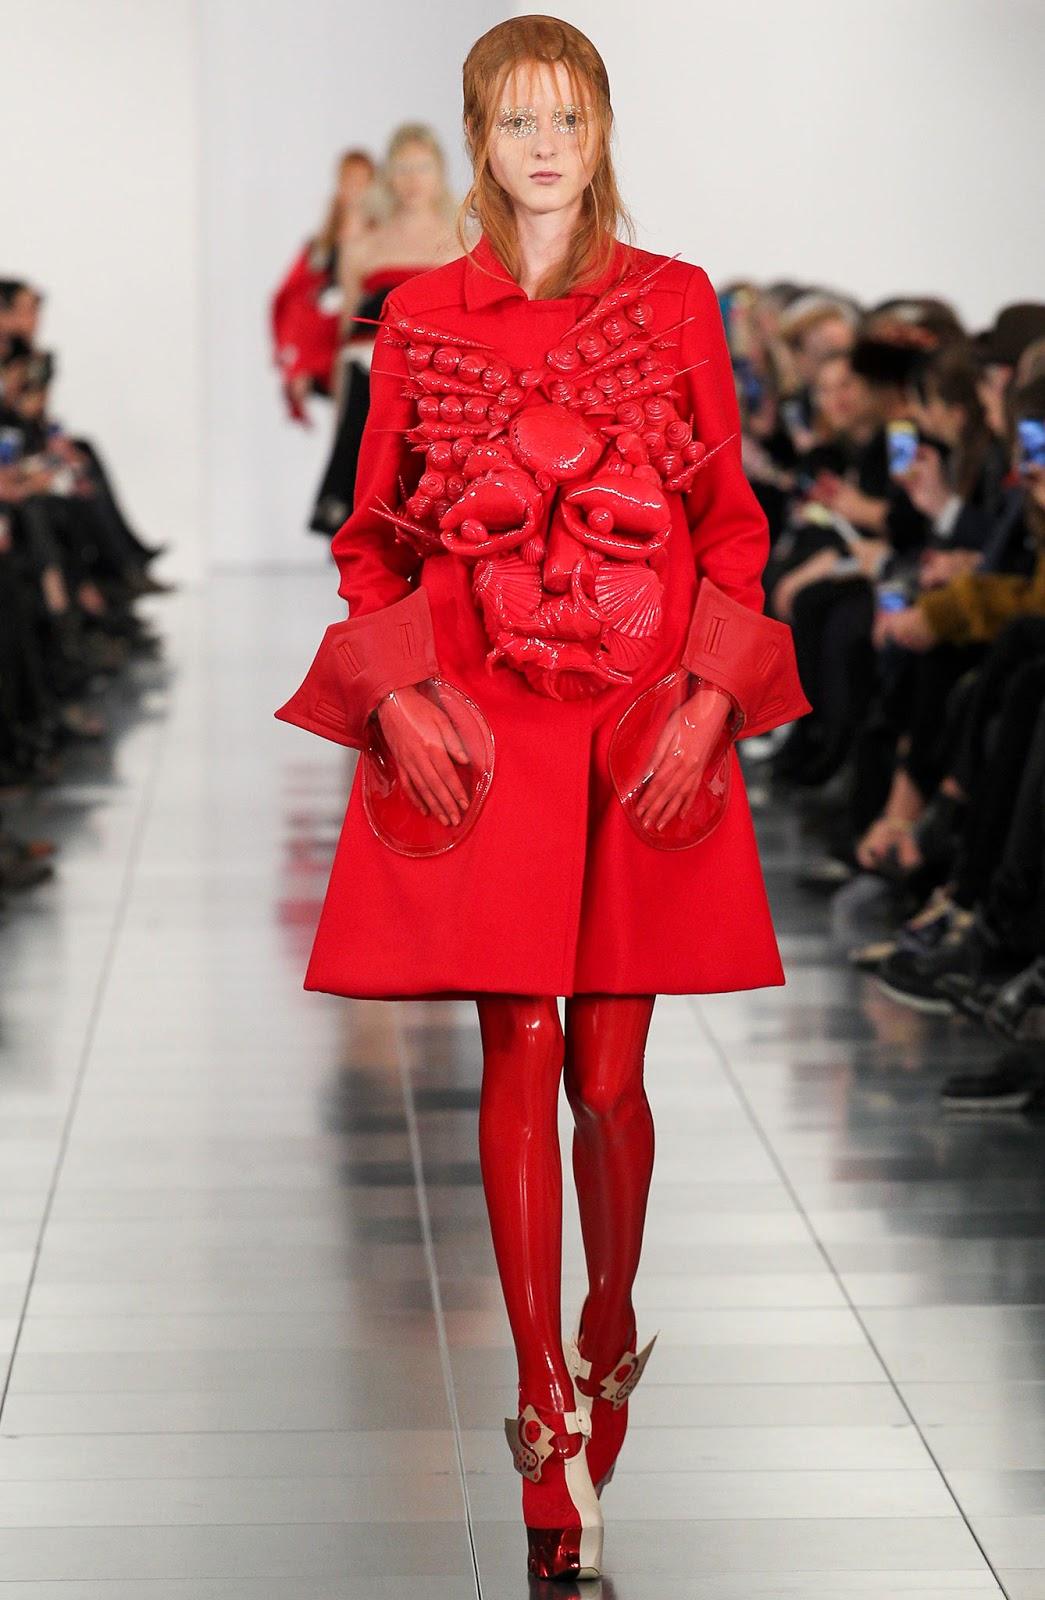 via fashioned by love | John Galliano Maison Martin Margiela Couture Spring/Summer 2015